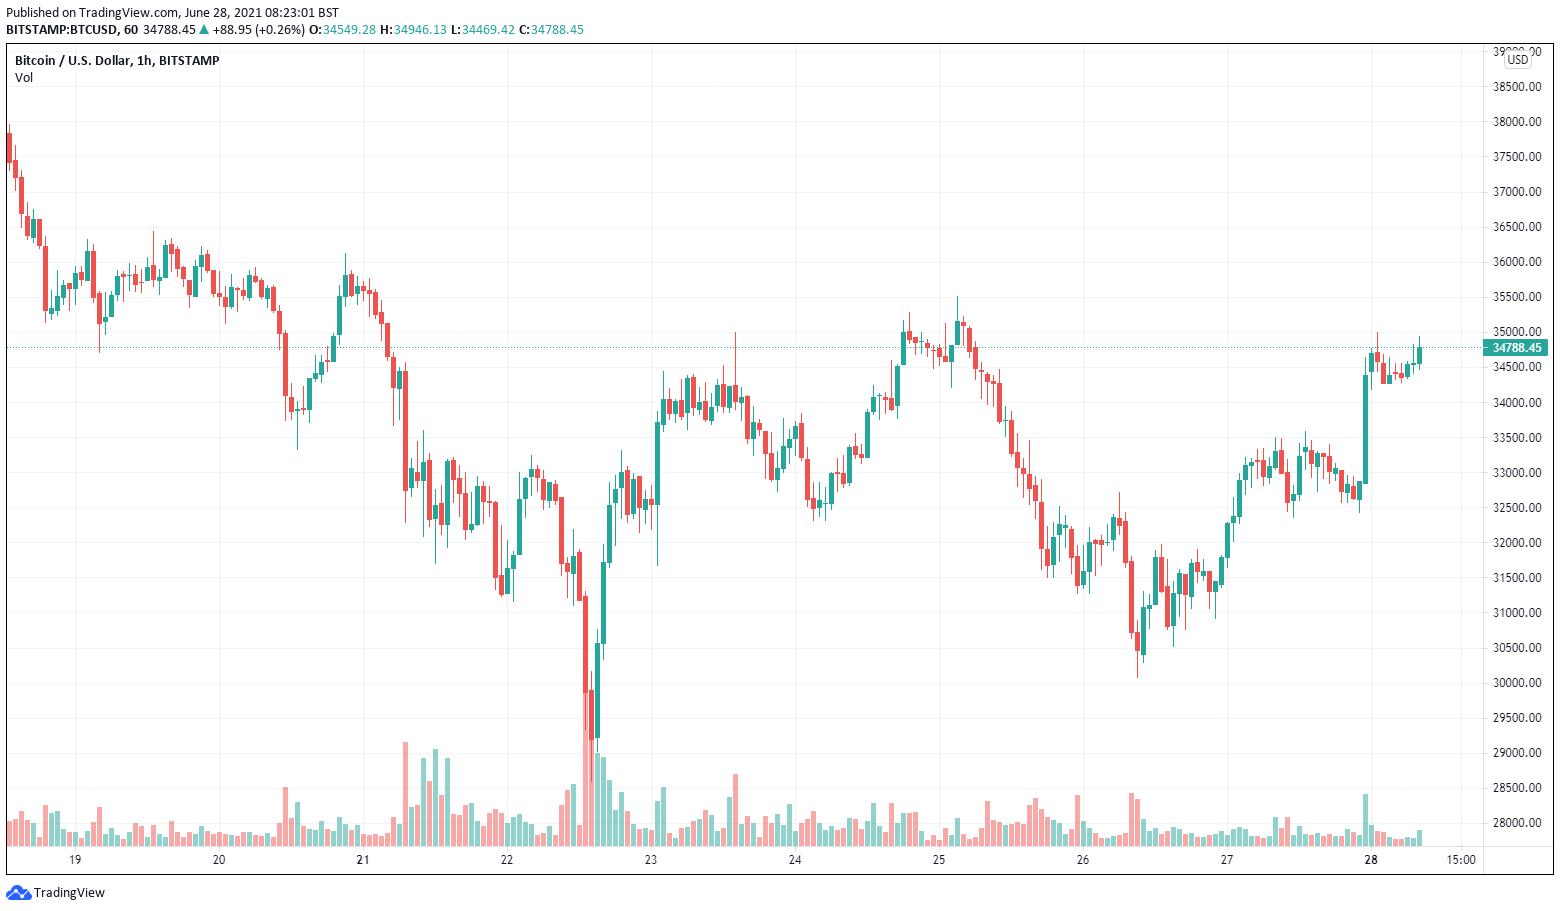 BTC/USD, grafico candele a un'ora (Bitstamp). Fonte: TradingView